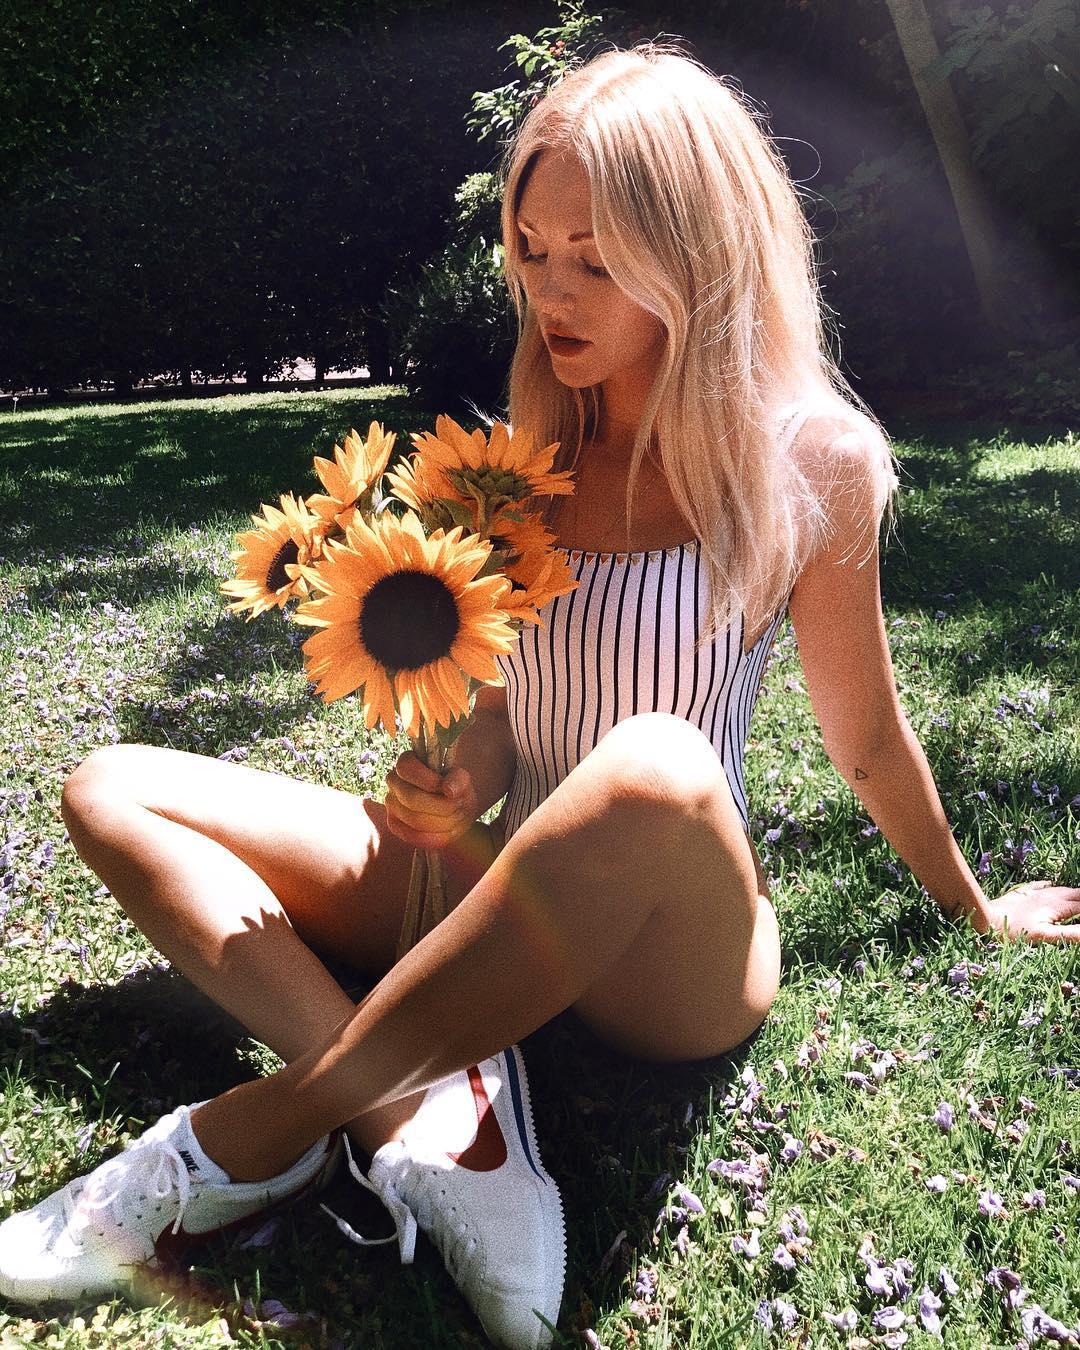 Shea Marie Instagram username